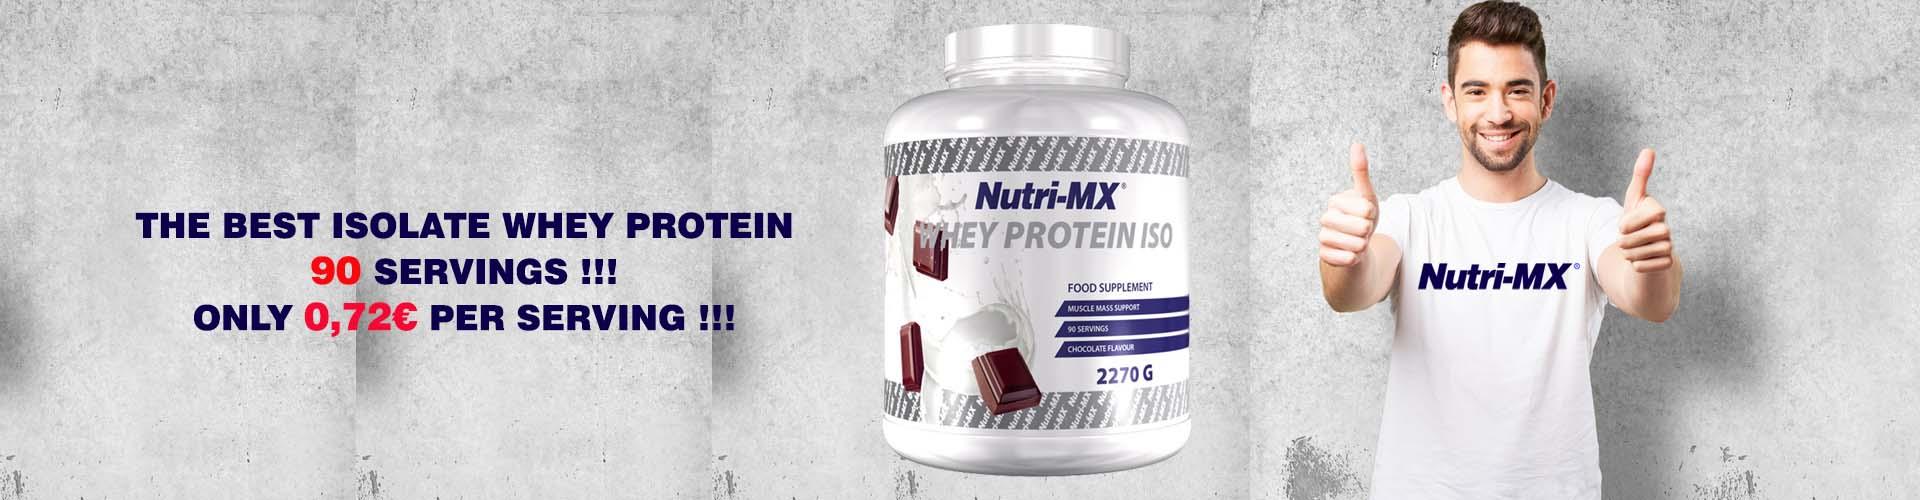 Nutri-MX Whey Protein ISO